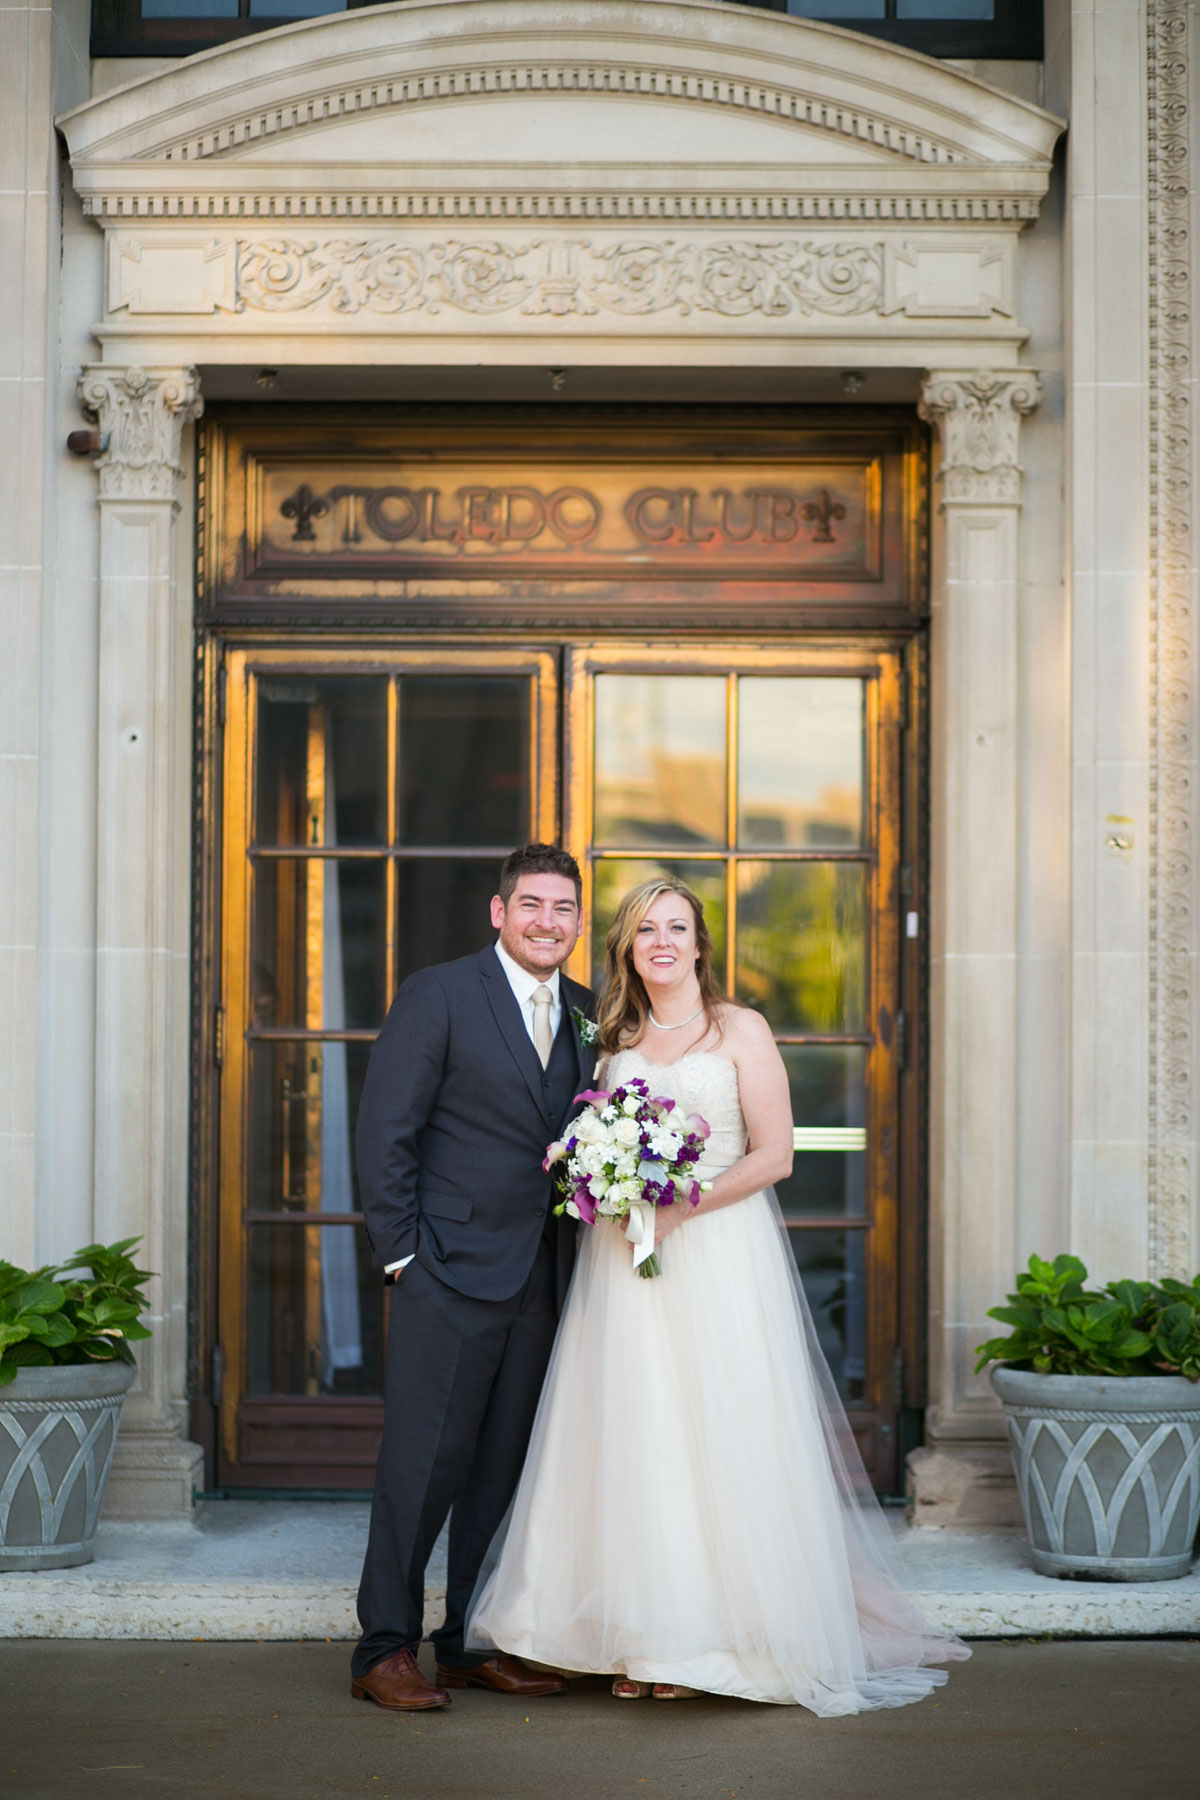 toledo-club-wedding-photos (83 of 101).jpg